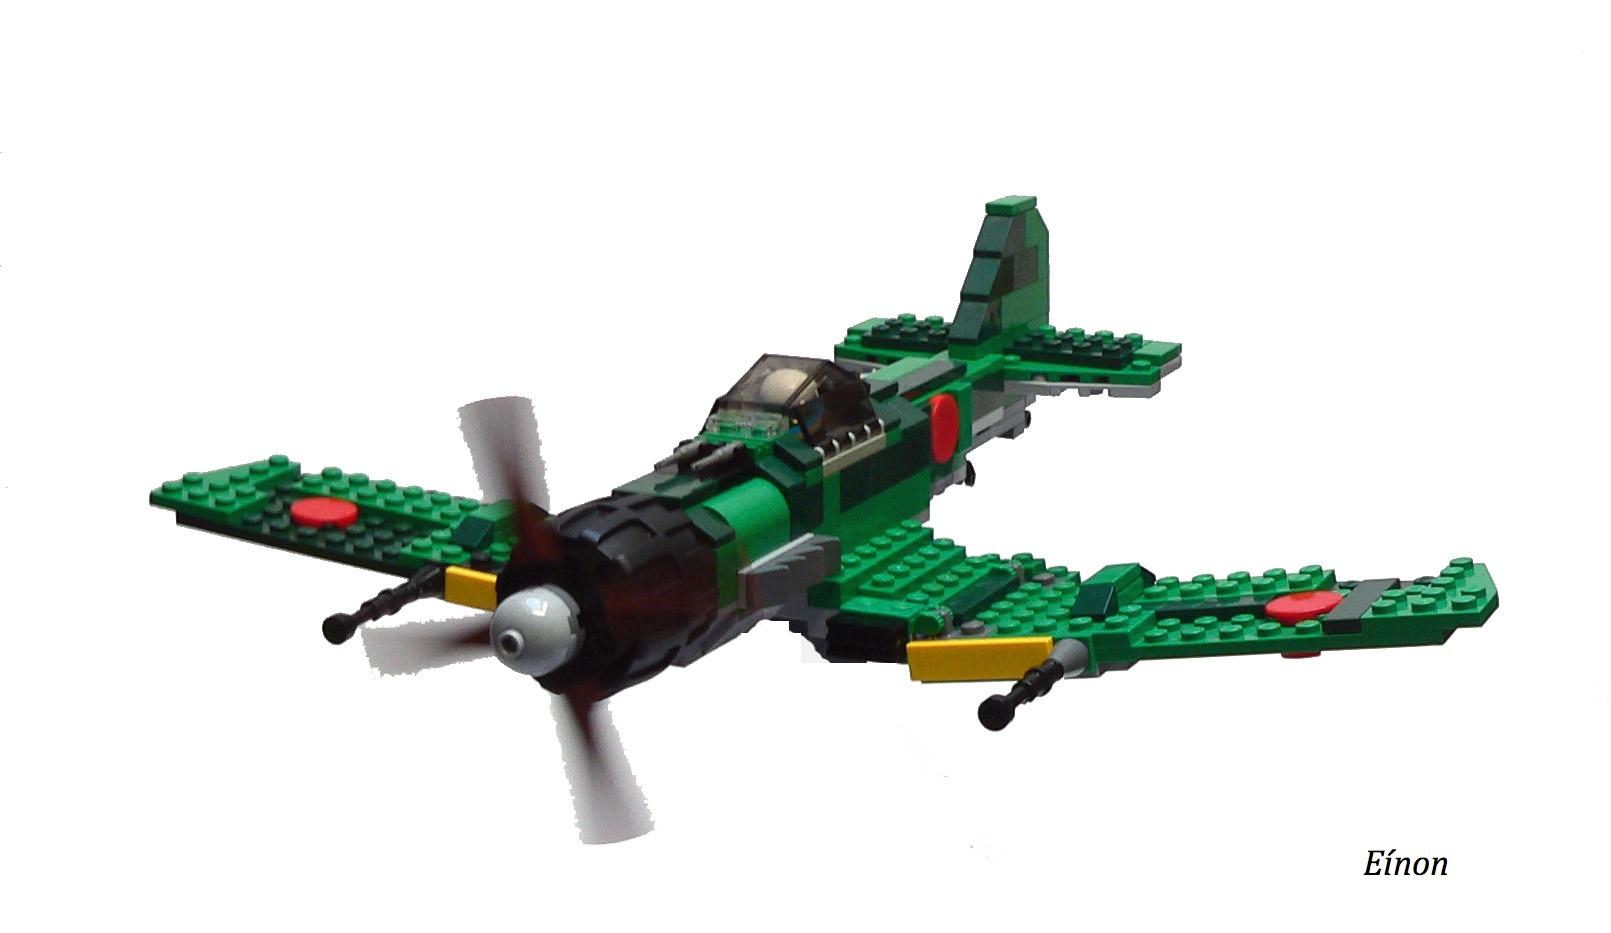 Nakajima Ki-125 Washi (allied code-name Eddie) | Flickr - Photo ...